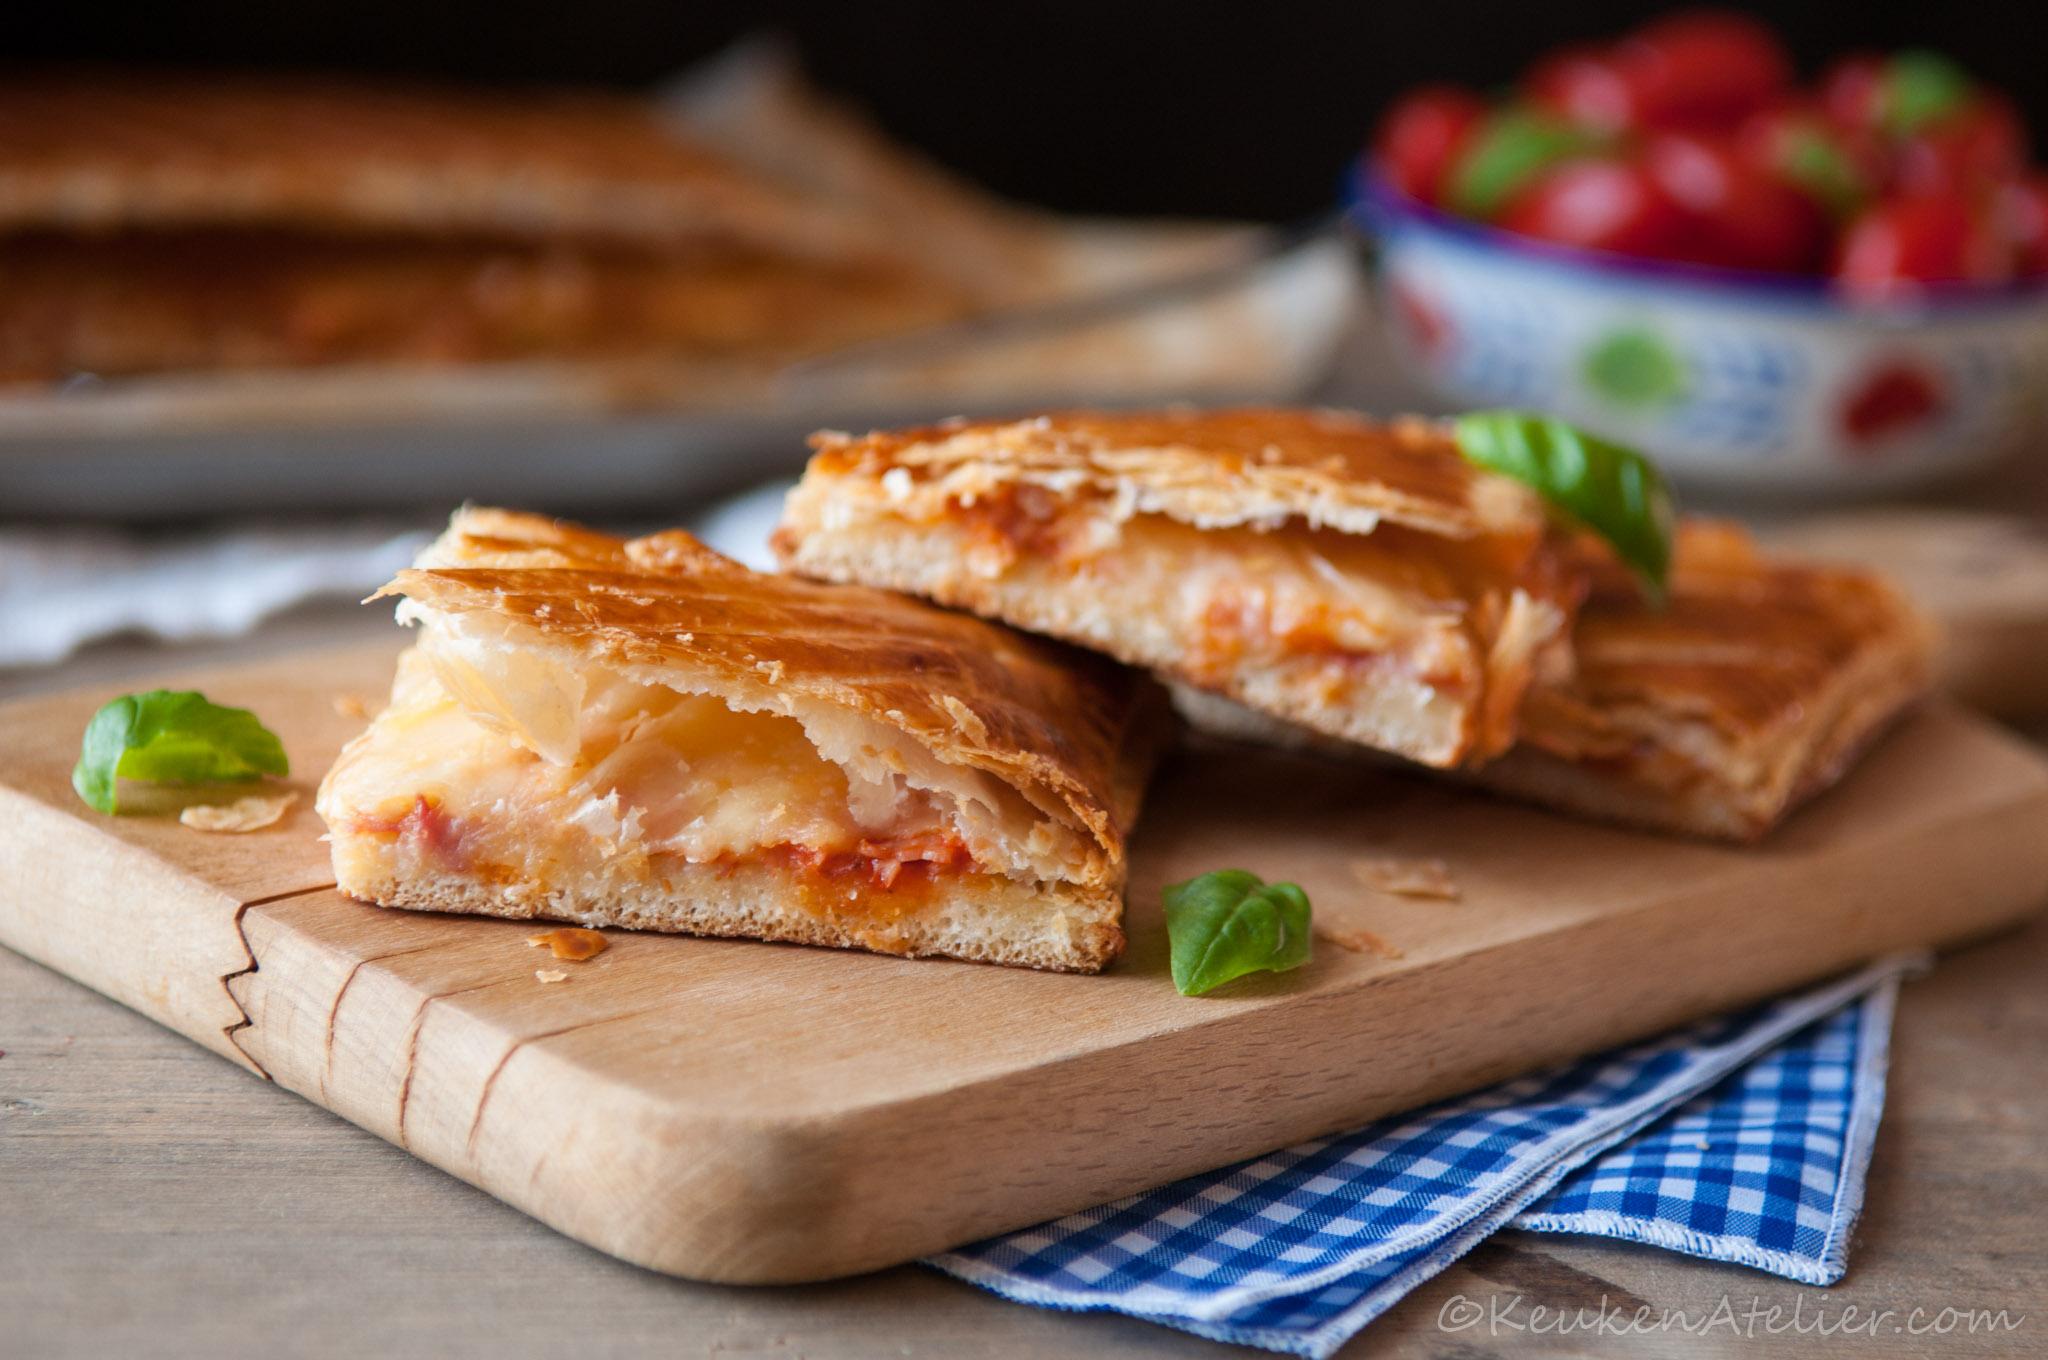 Pizza Parigina 2- Pizza uit Napels | Keukenatelier.com